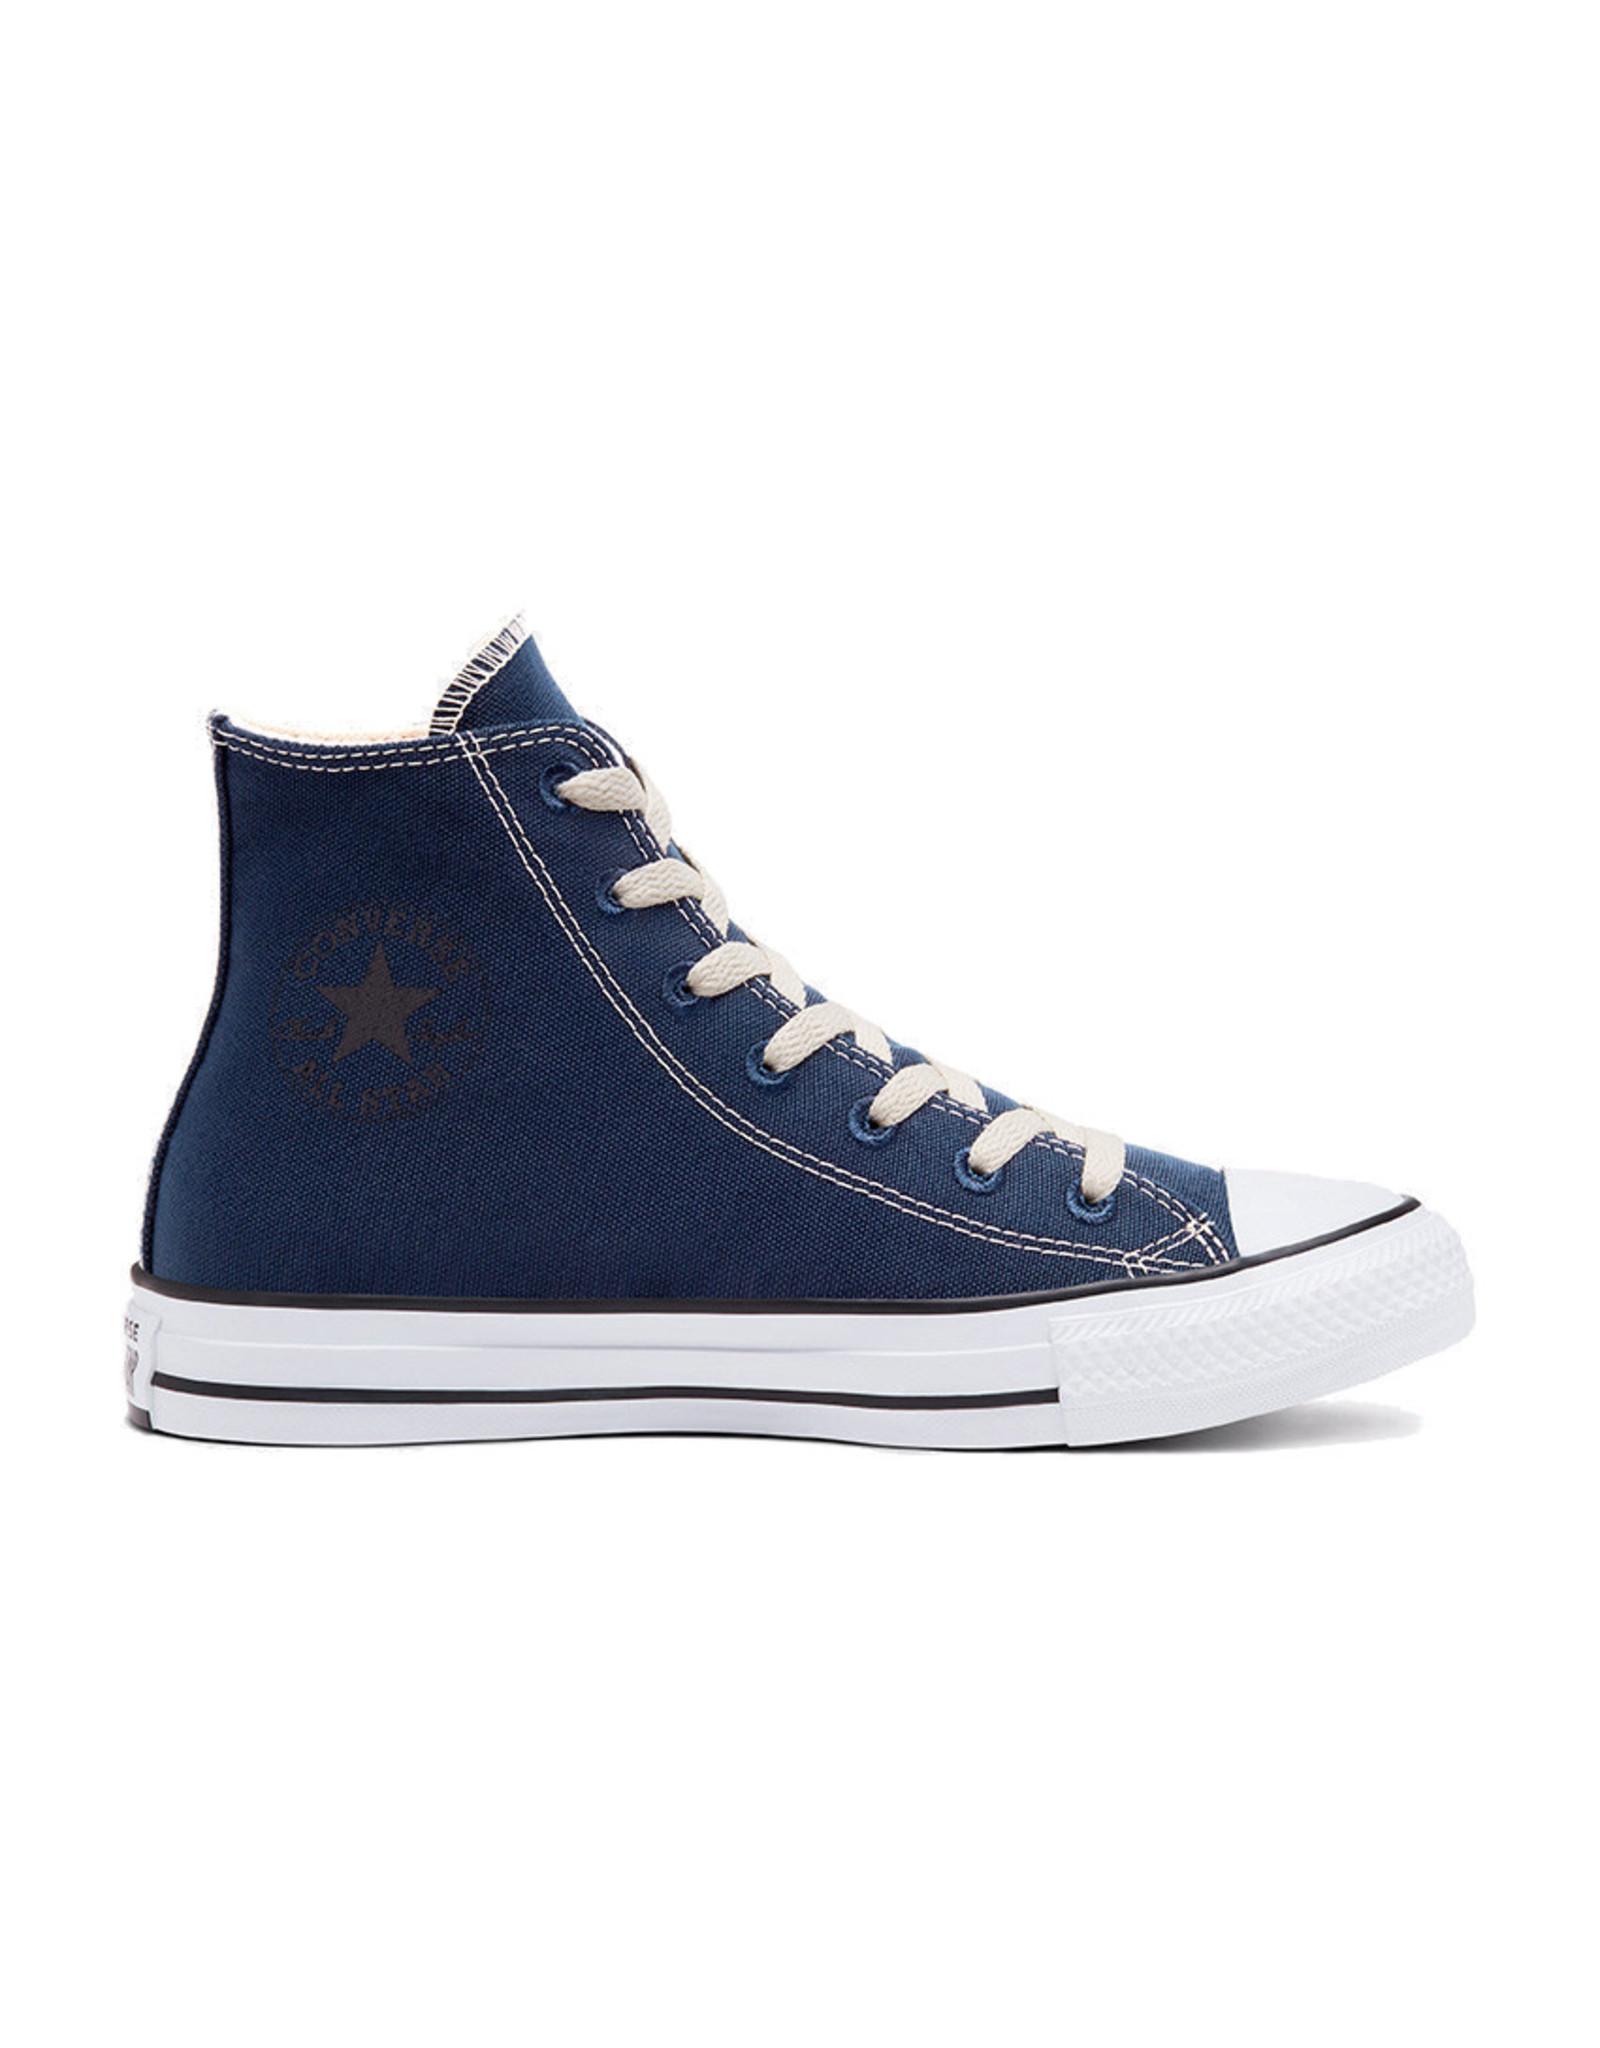 CONVERSE CHUCK TAYLOR ALL STAR HI OBSIDIAN/EGRET/WHITE C19REN-166372C